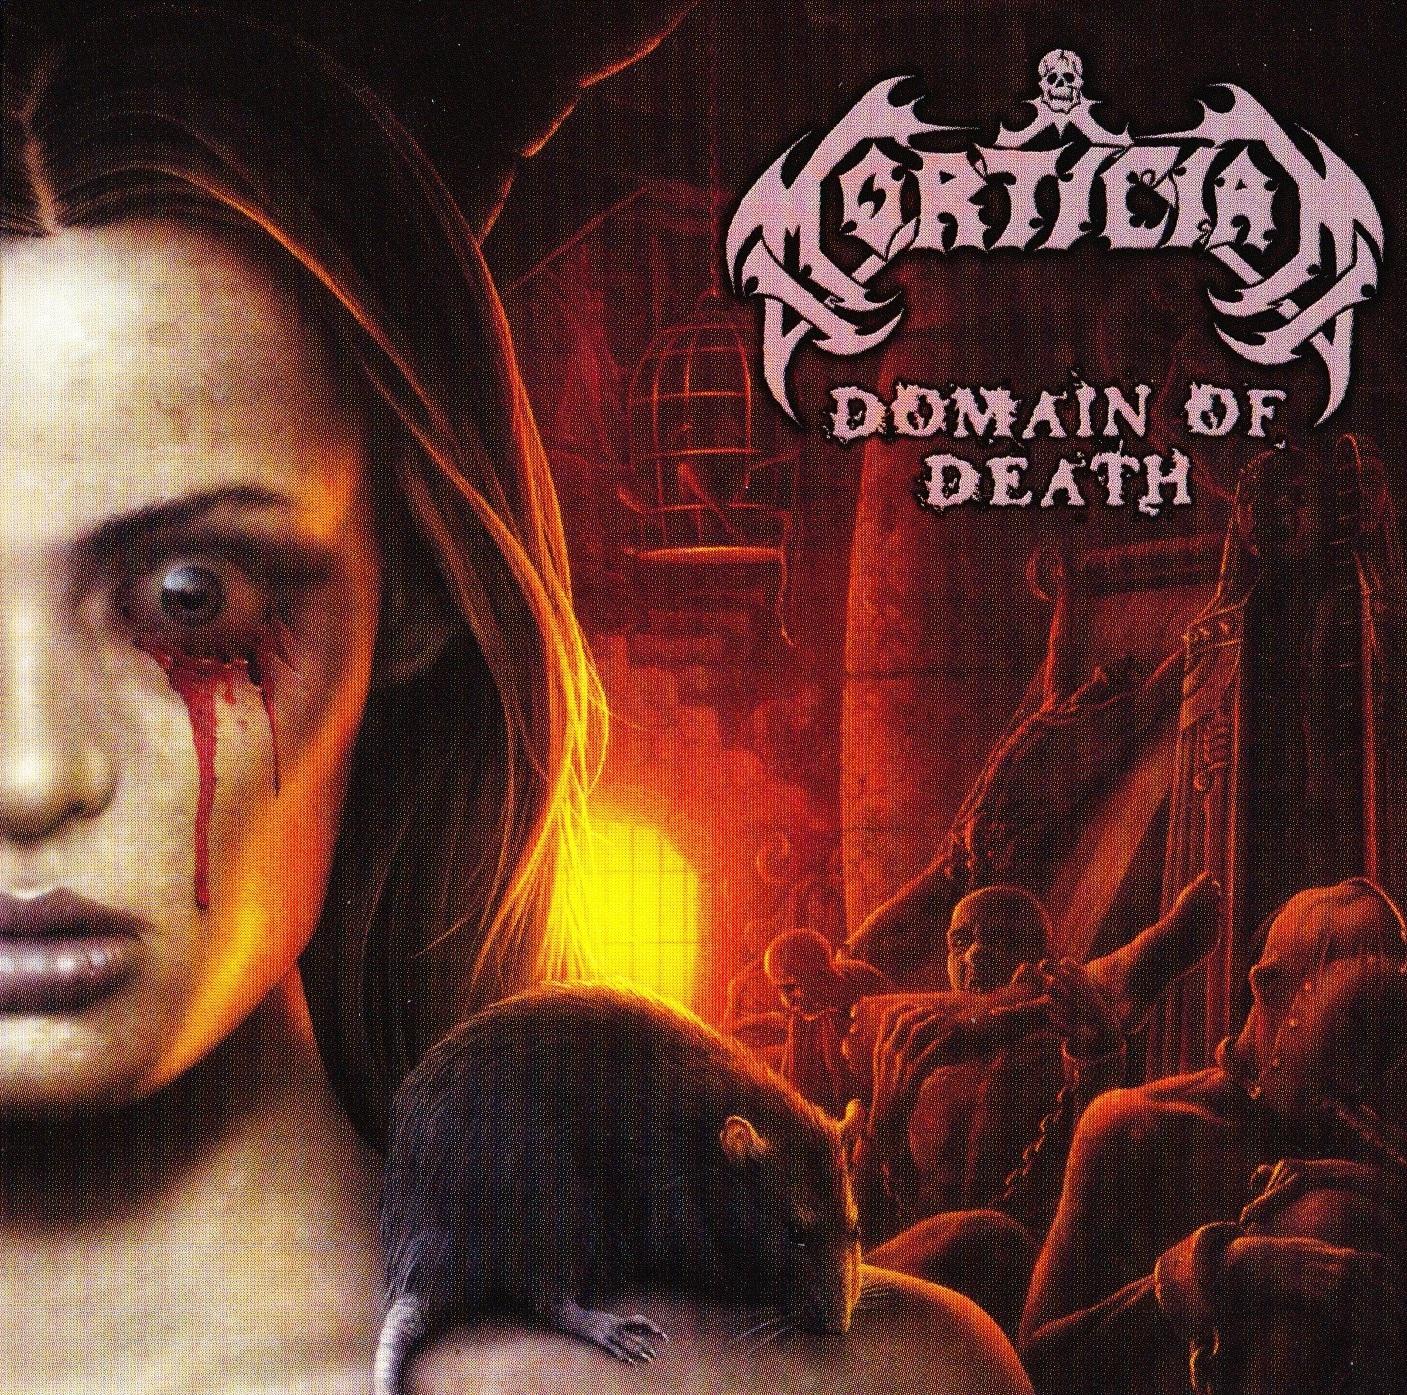 Mortician — Domain Of Death (2001)